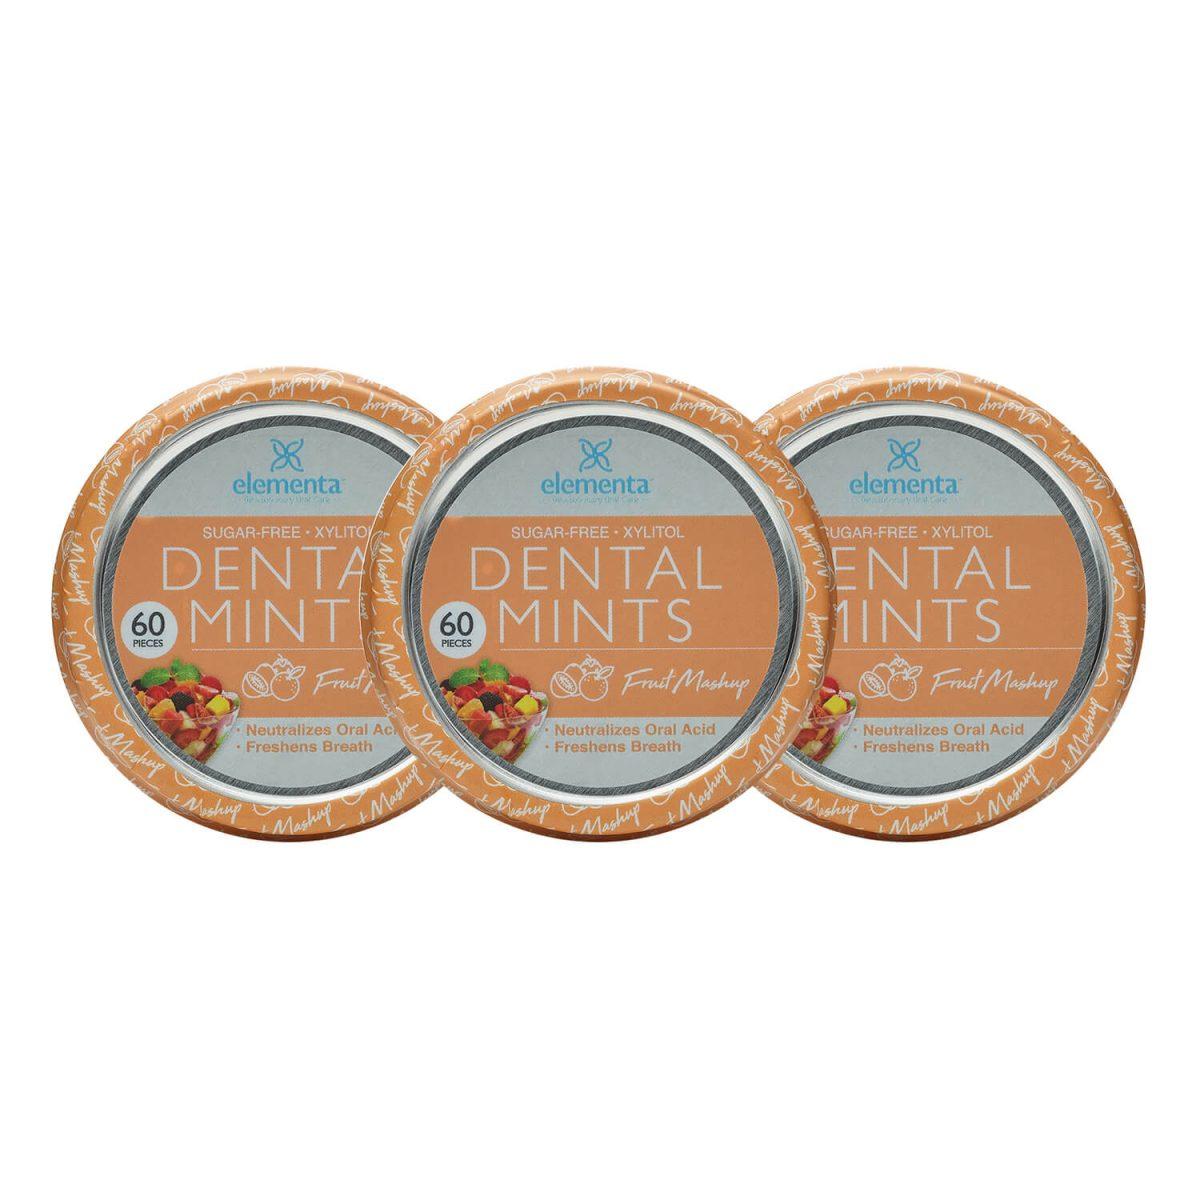 nano silver dental mints fruit mashup 3 pack